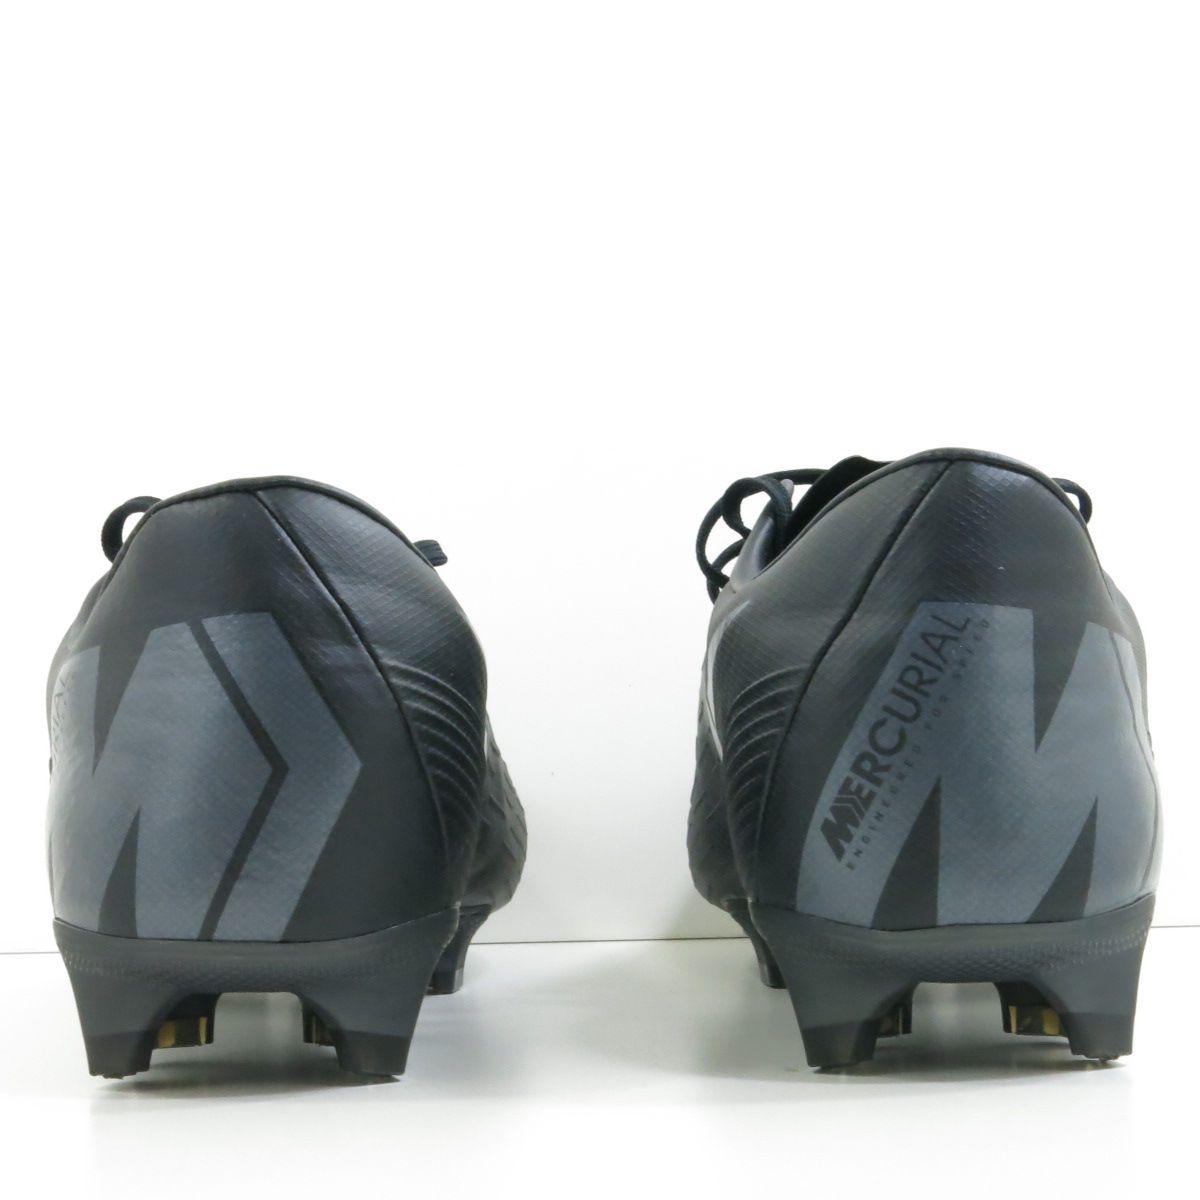 Chuteira Nike Mercurial Vapor Pro FG